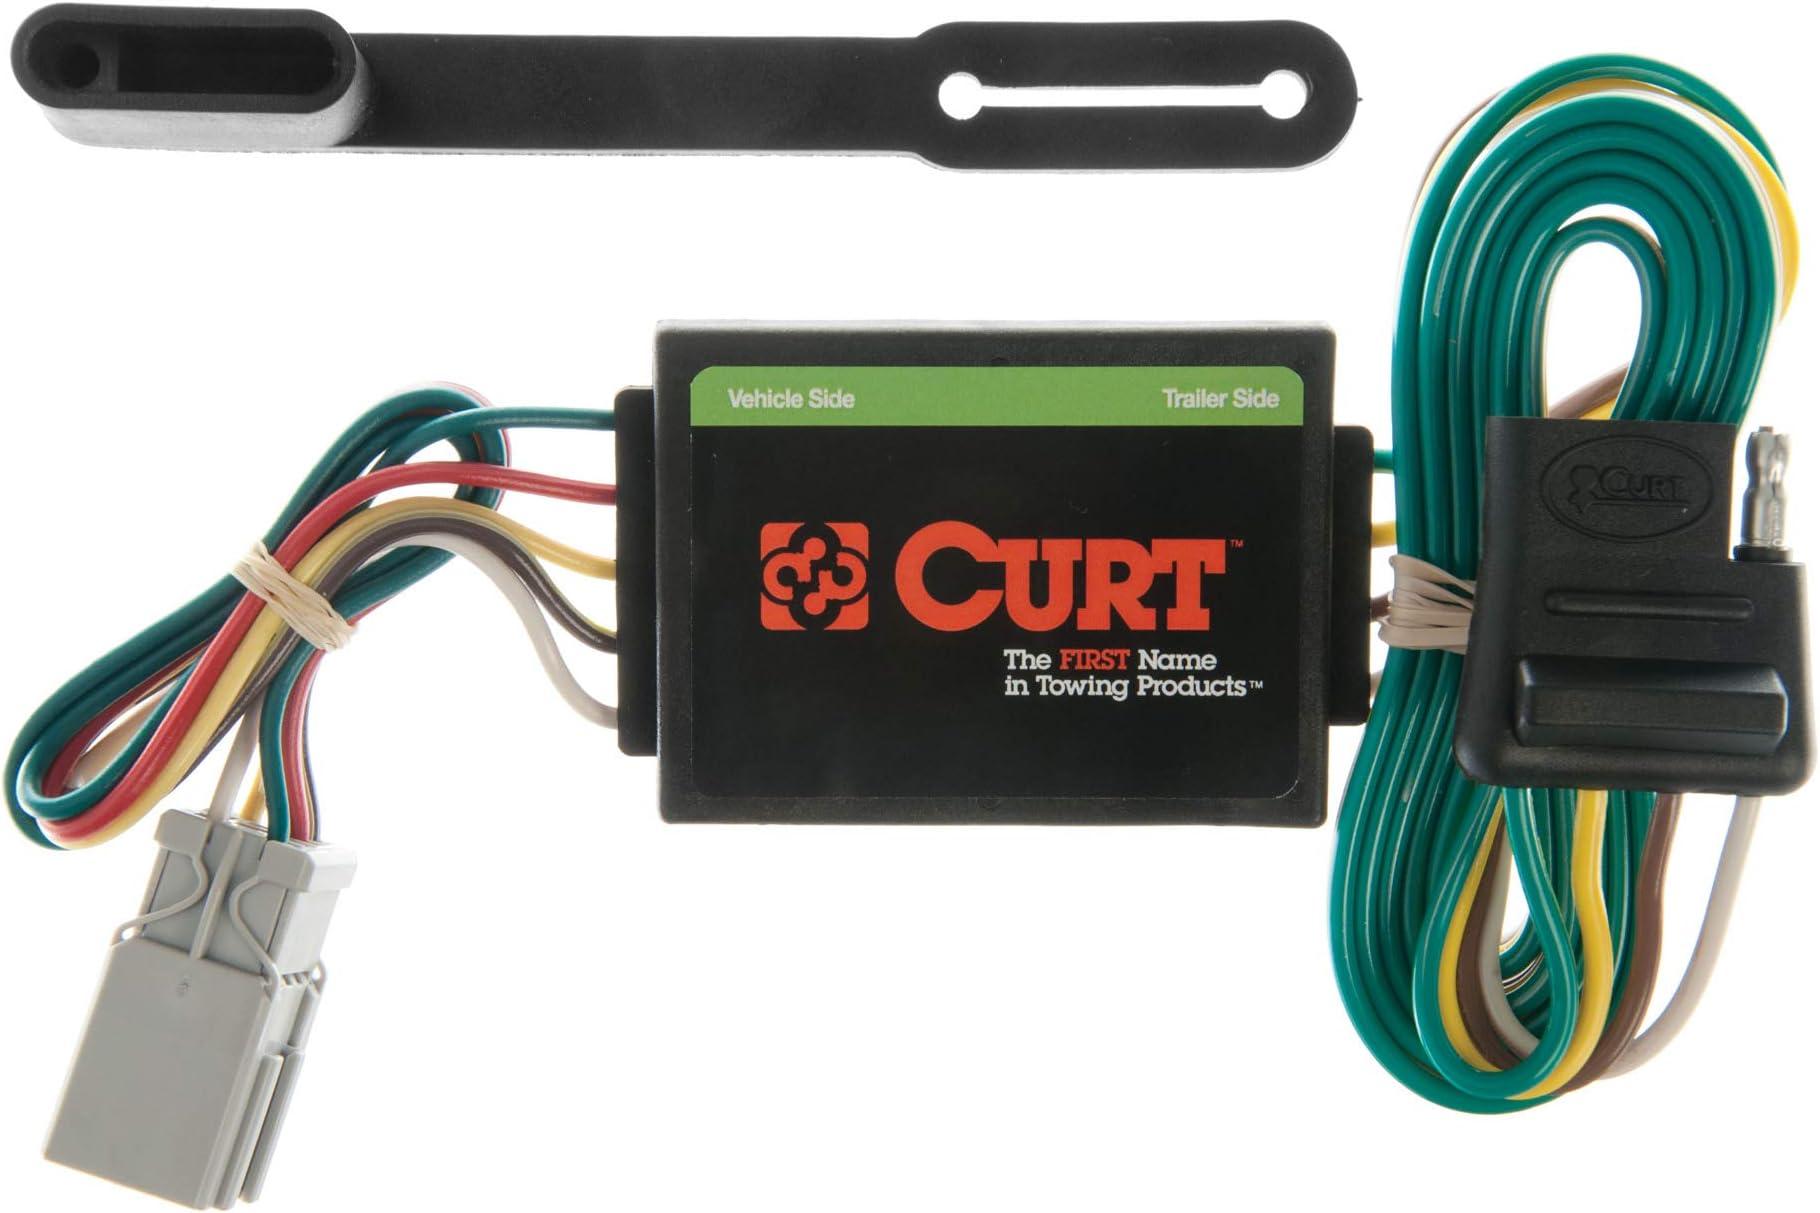 CURT 400 Vehicle Side Custom 40 Pin Trailer Wiring Harness, Select Honda  Accord, CR V, Odyssey, Pilot, Acura Integra, CL, RL, TL, MDX